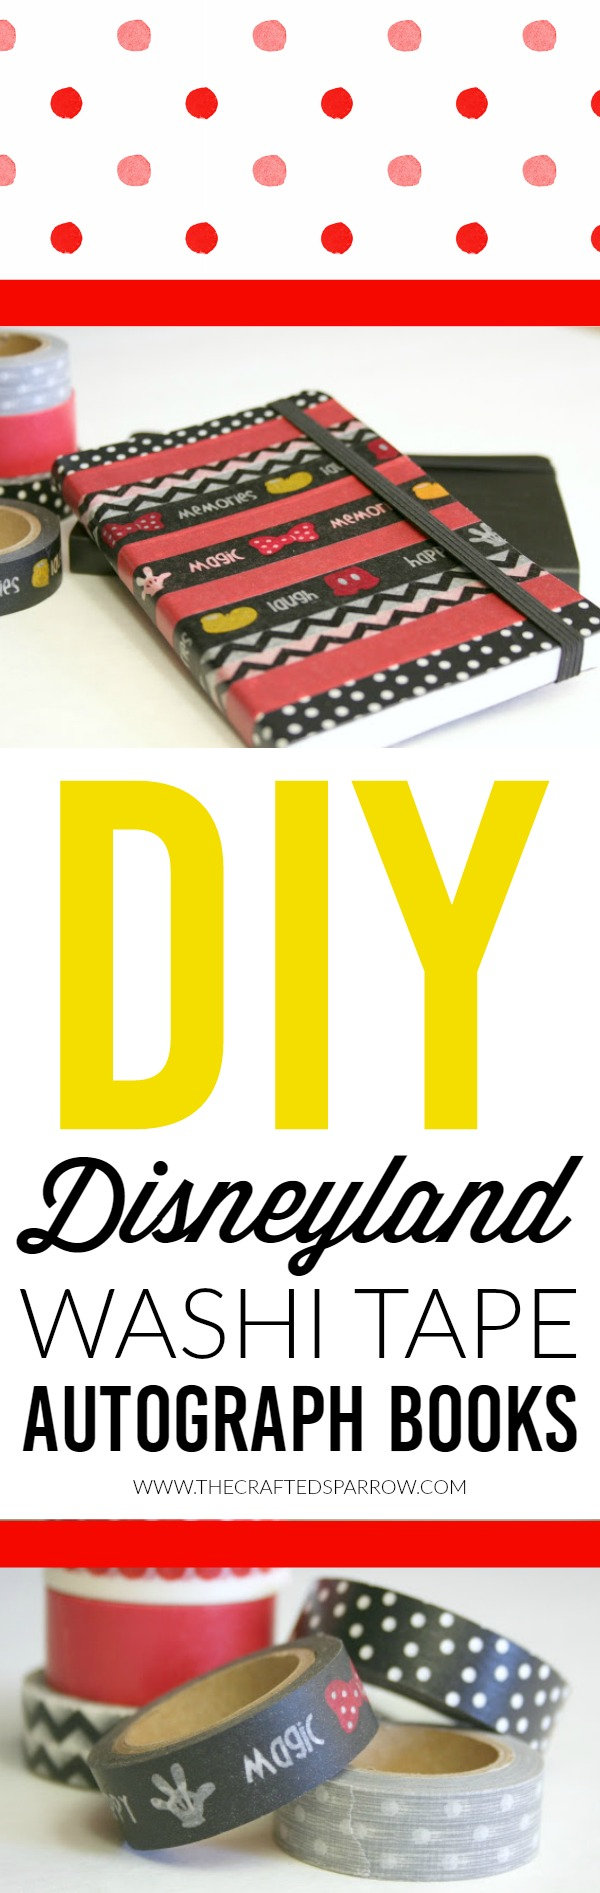 DIY Disneyland Washi Tape Autograph Books